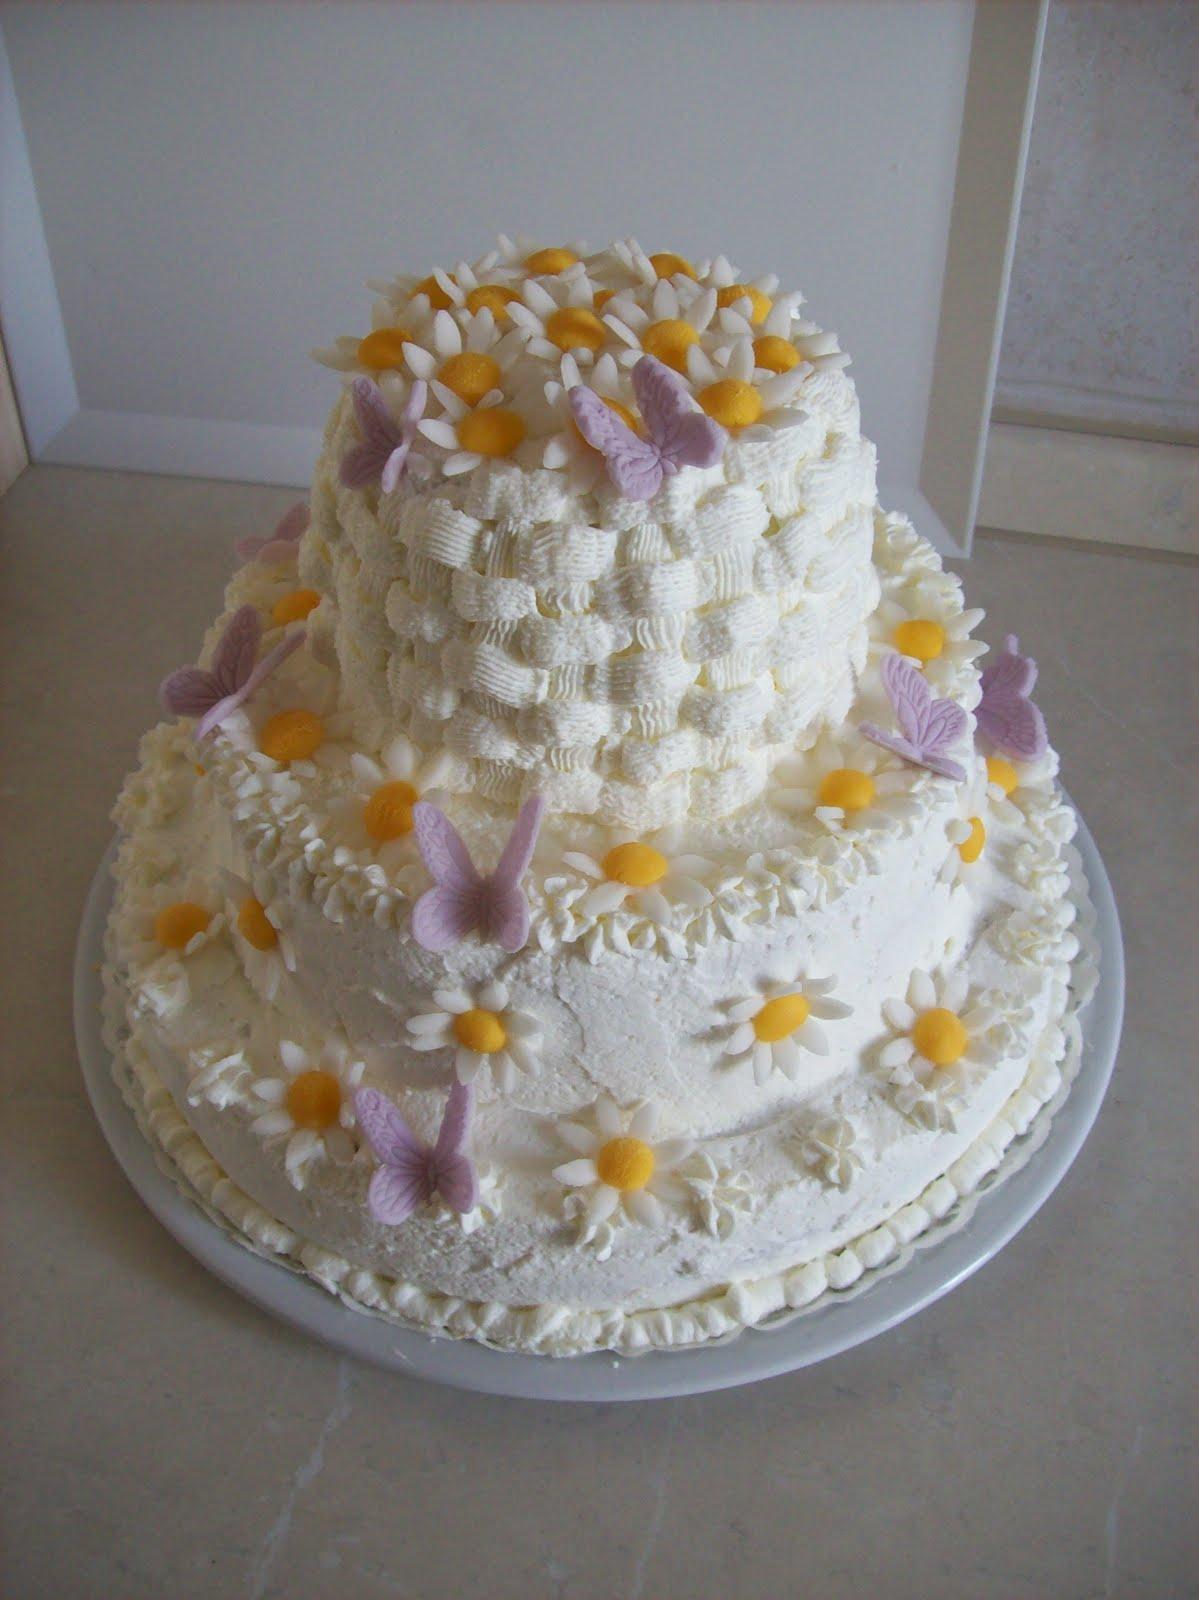 Cake Design In Kl : Torte Fatate: Torta margherite e farfalle